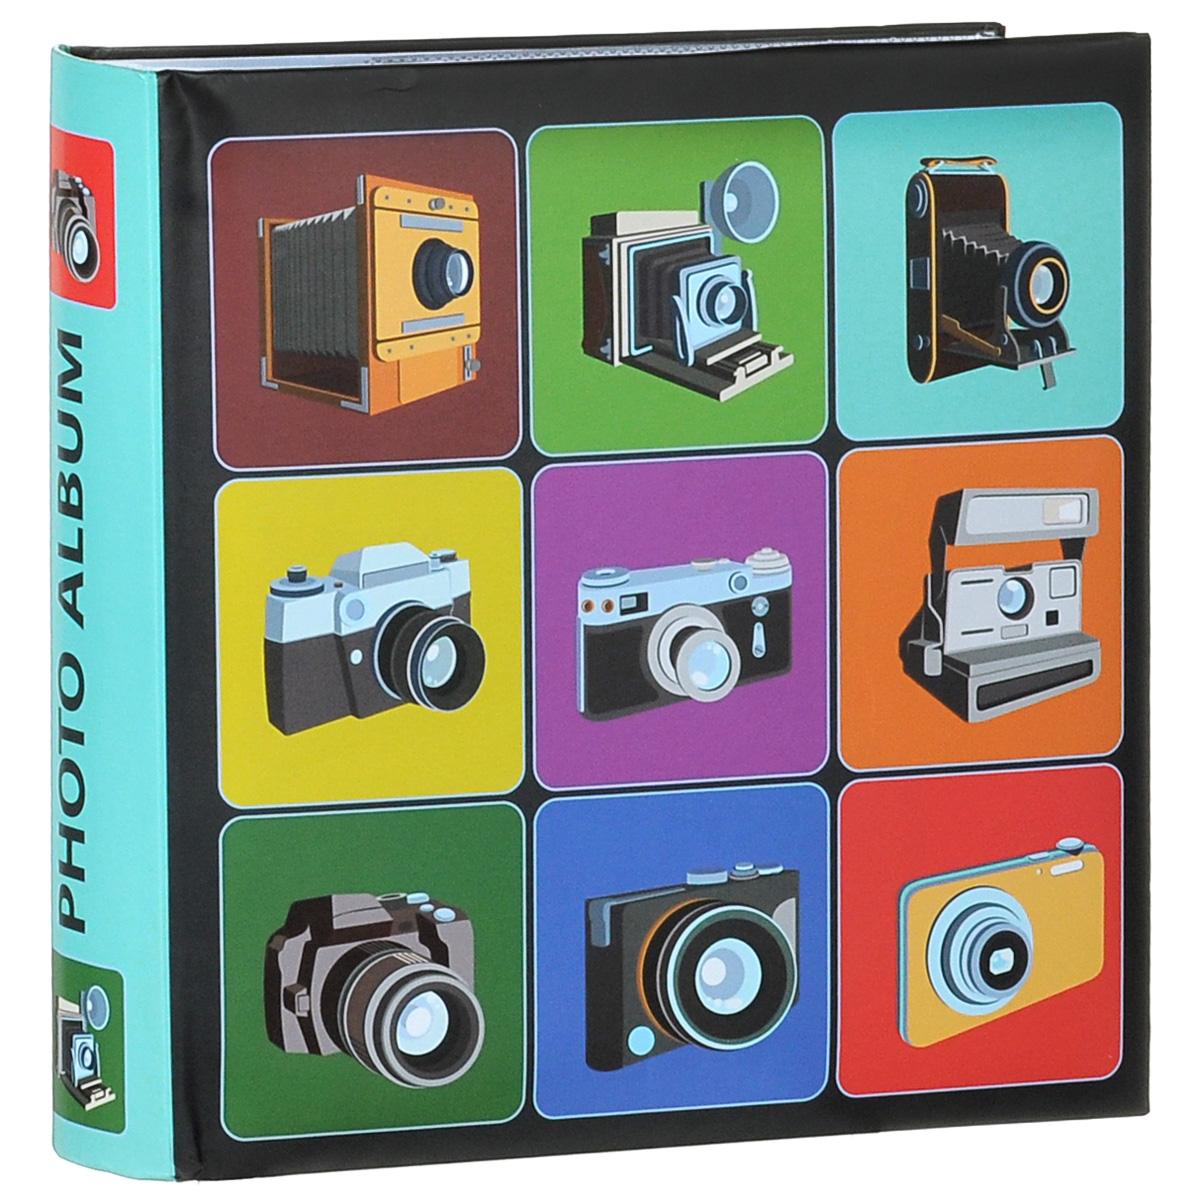 "Фотоальбом Феникс-презент ""Фотоэволюция"", 200 фотографий, 10 x 15 см 38824"